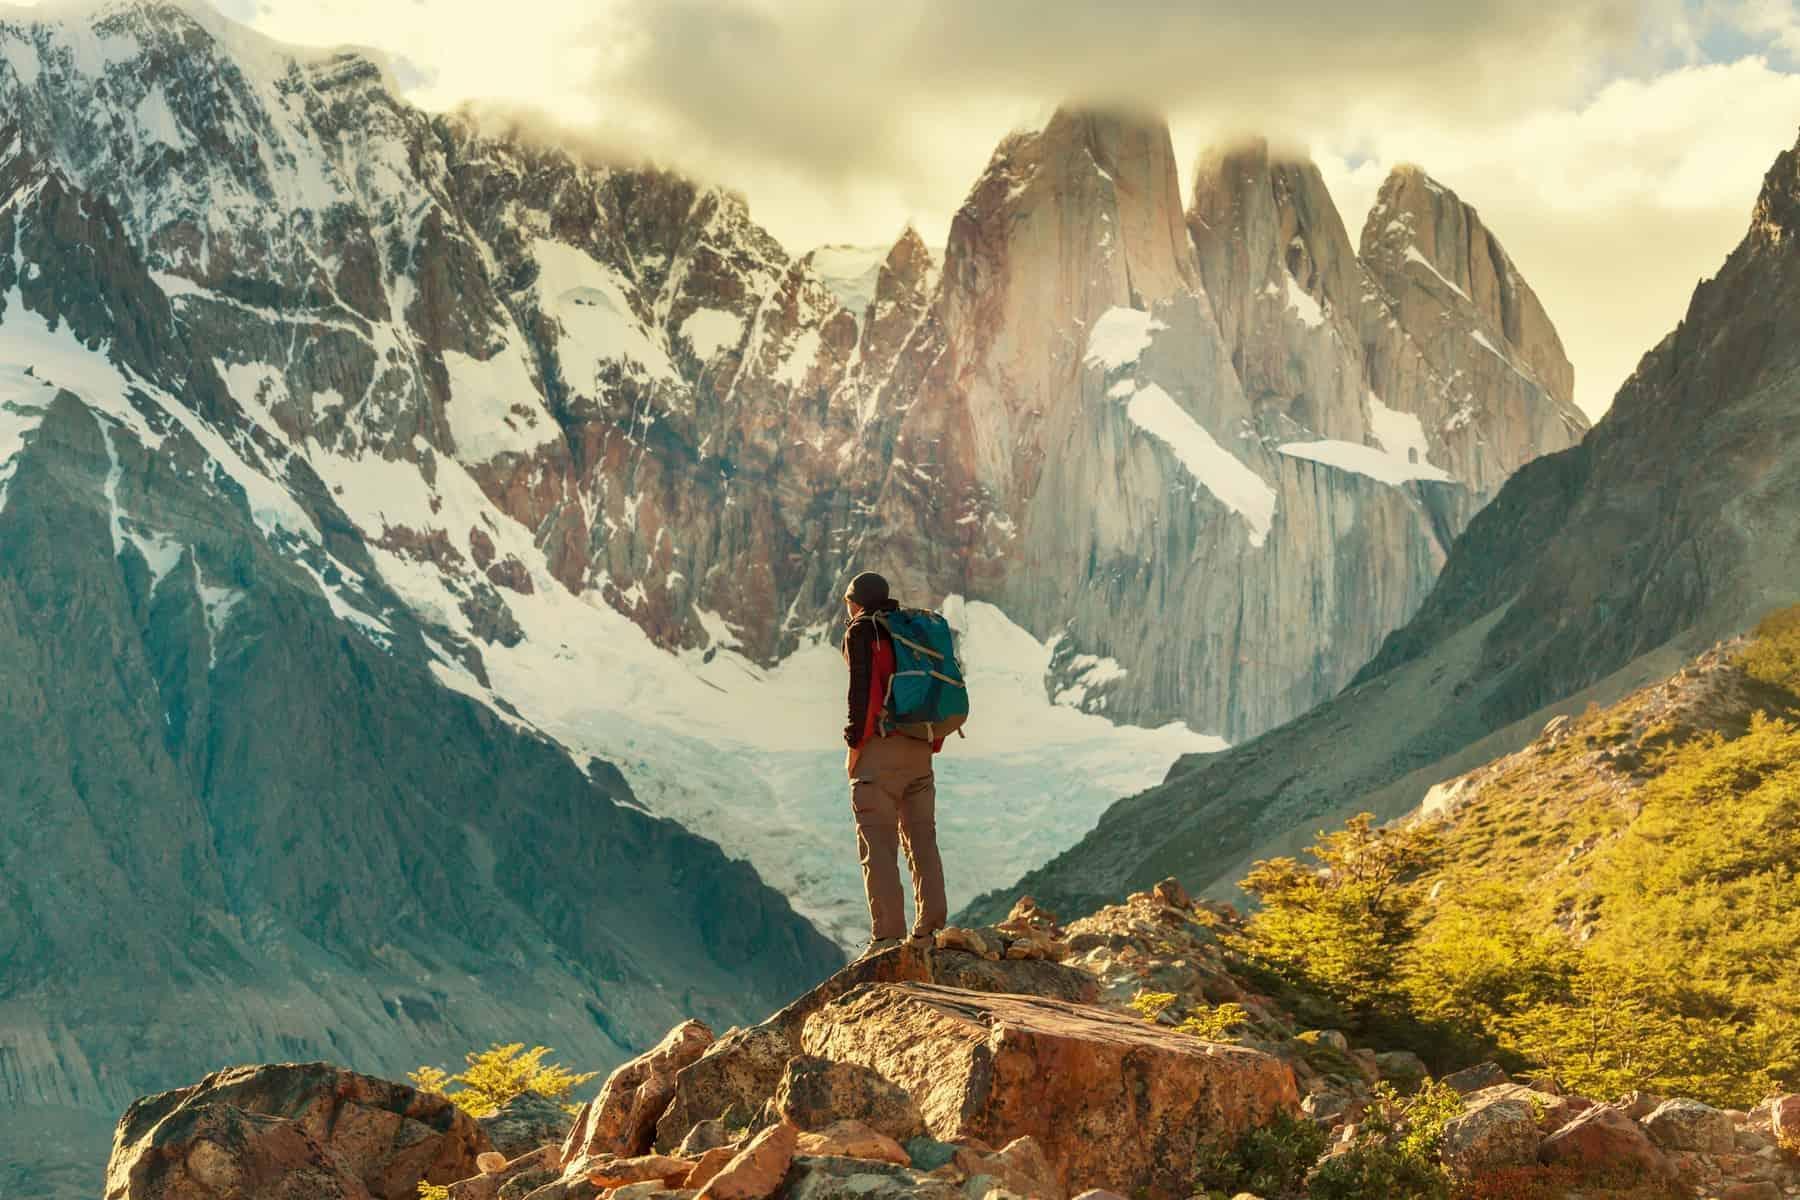 Backpacking in Patagonia